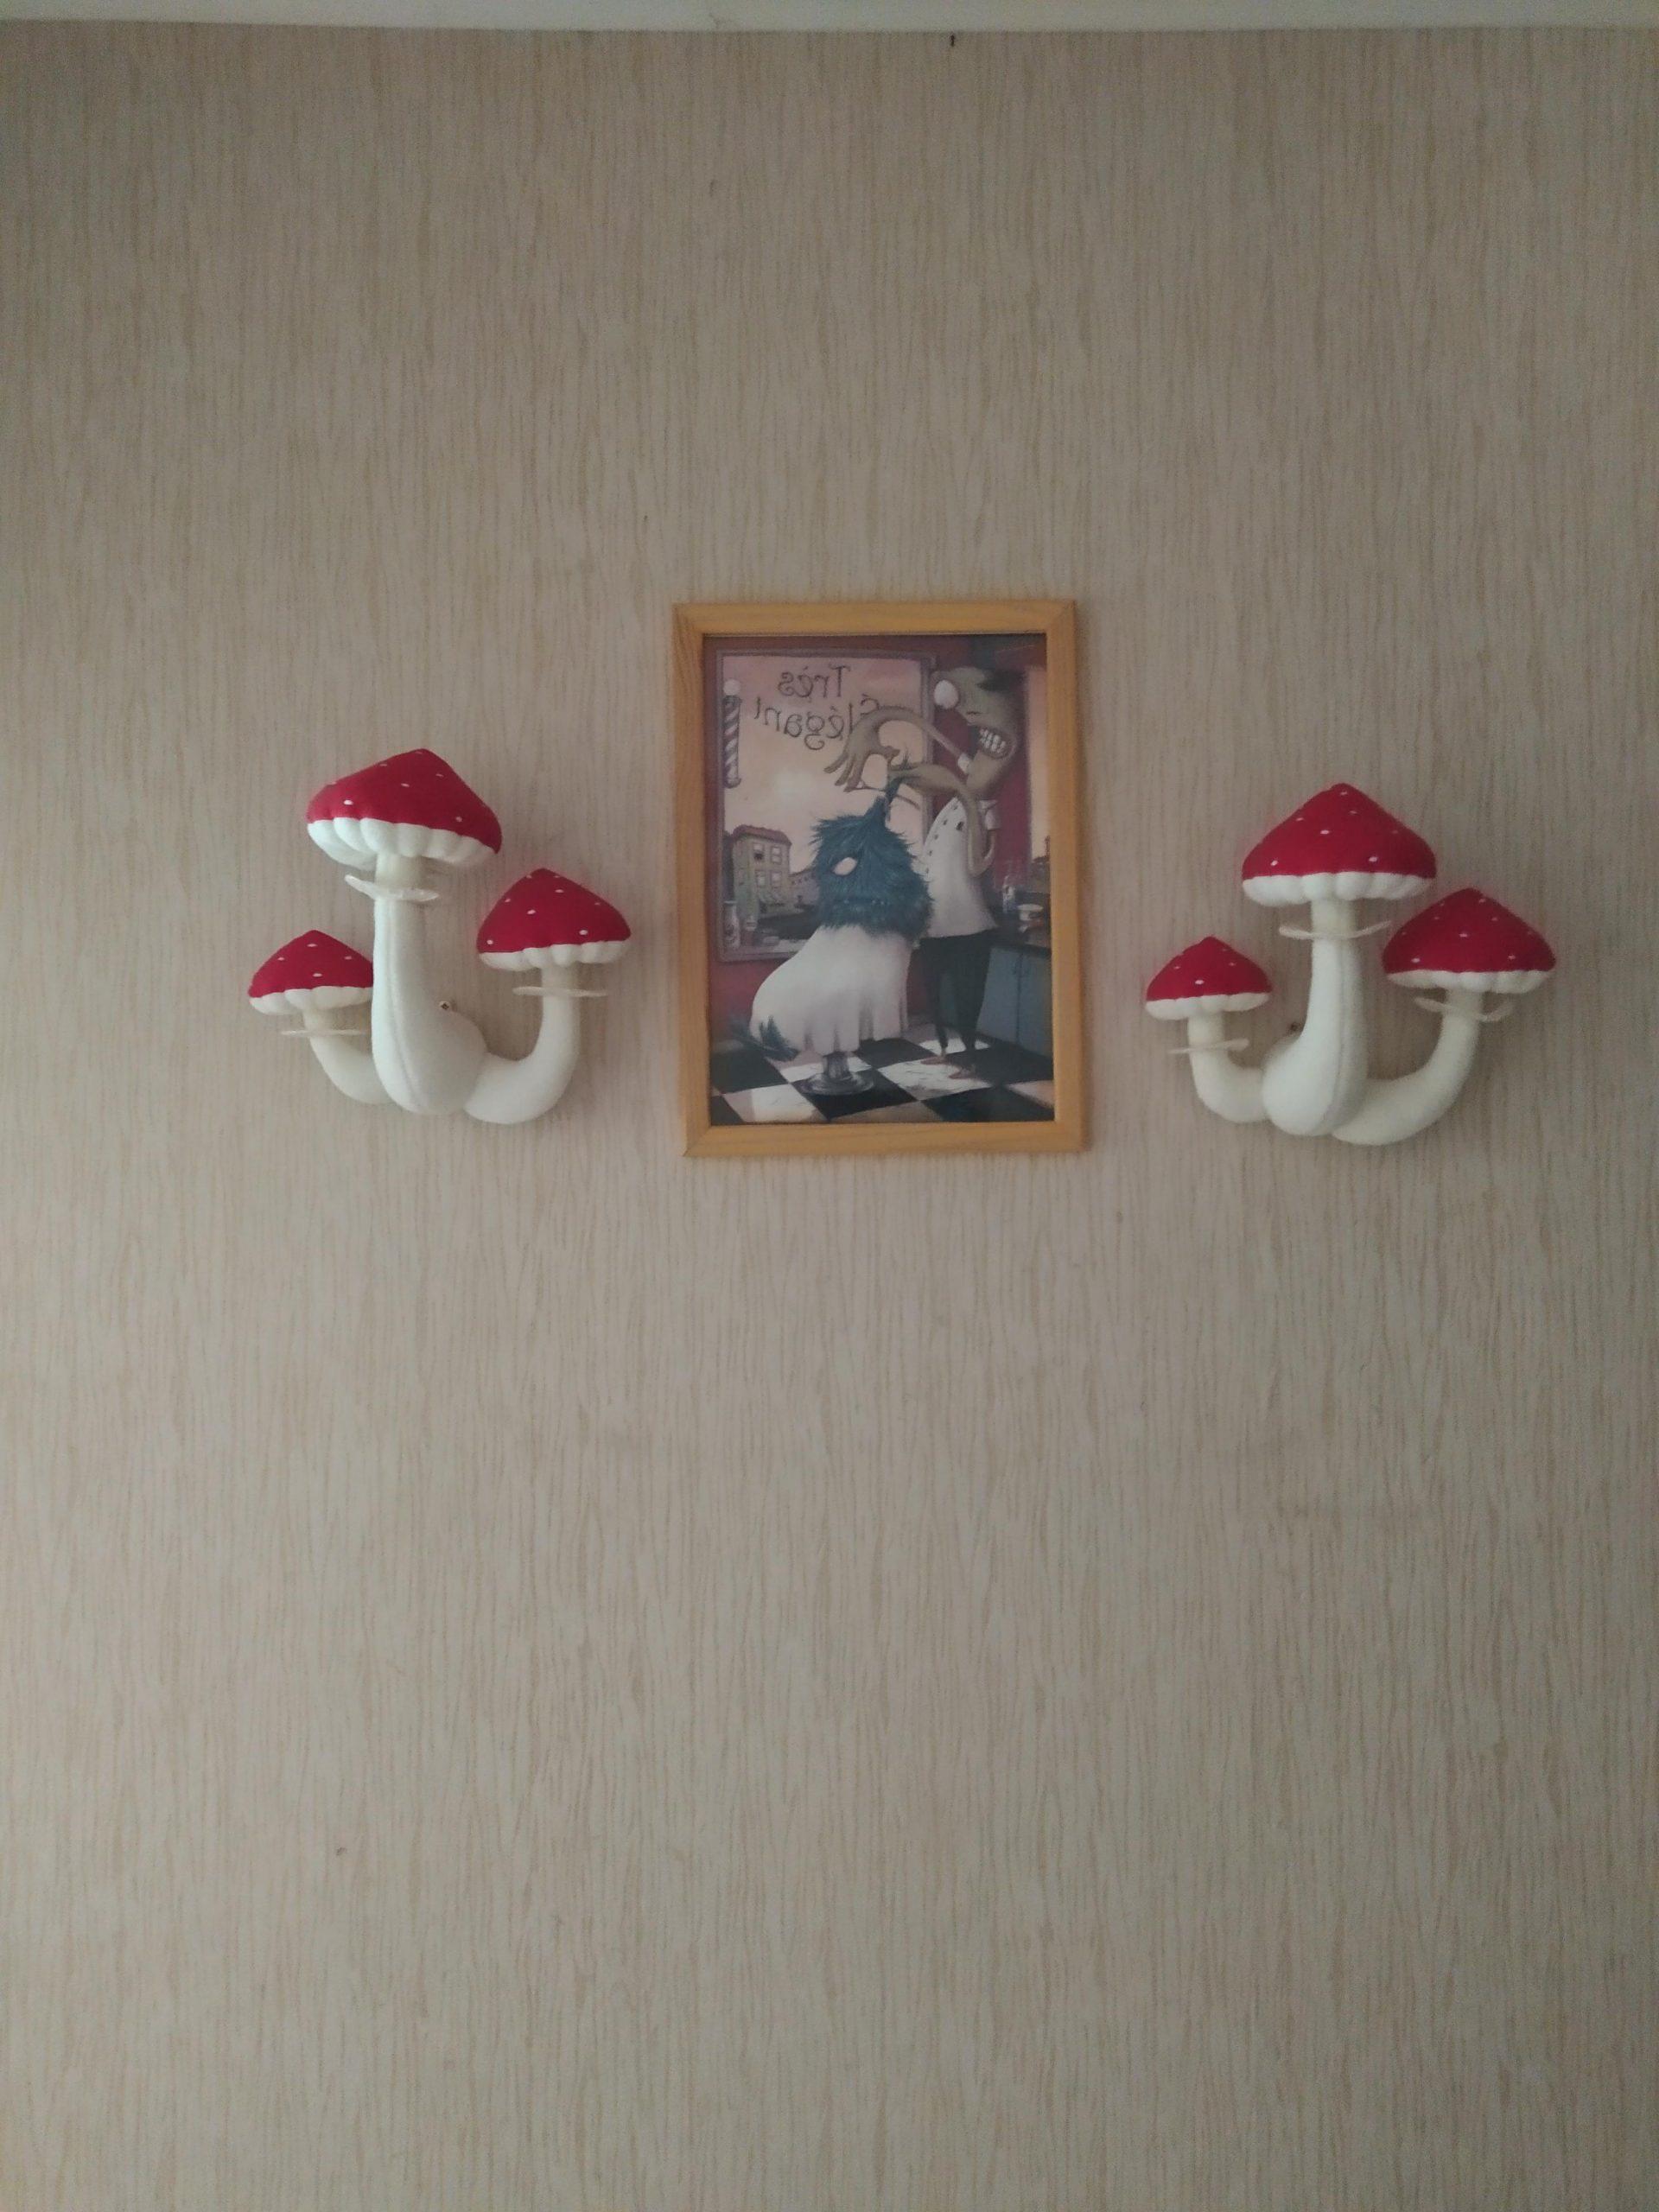 2irs42fy06b61 scaled - Mushrooms soft wall decor - hobbies, crafts